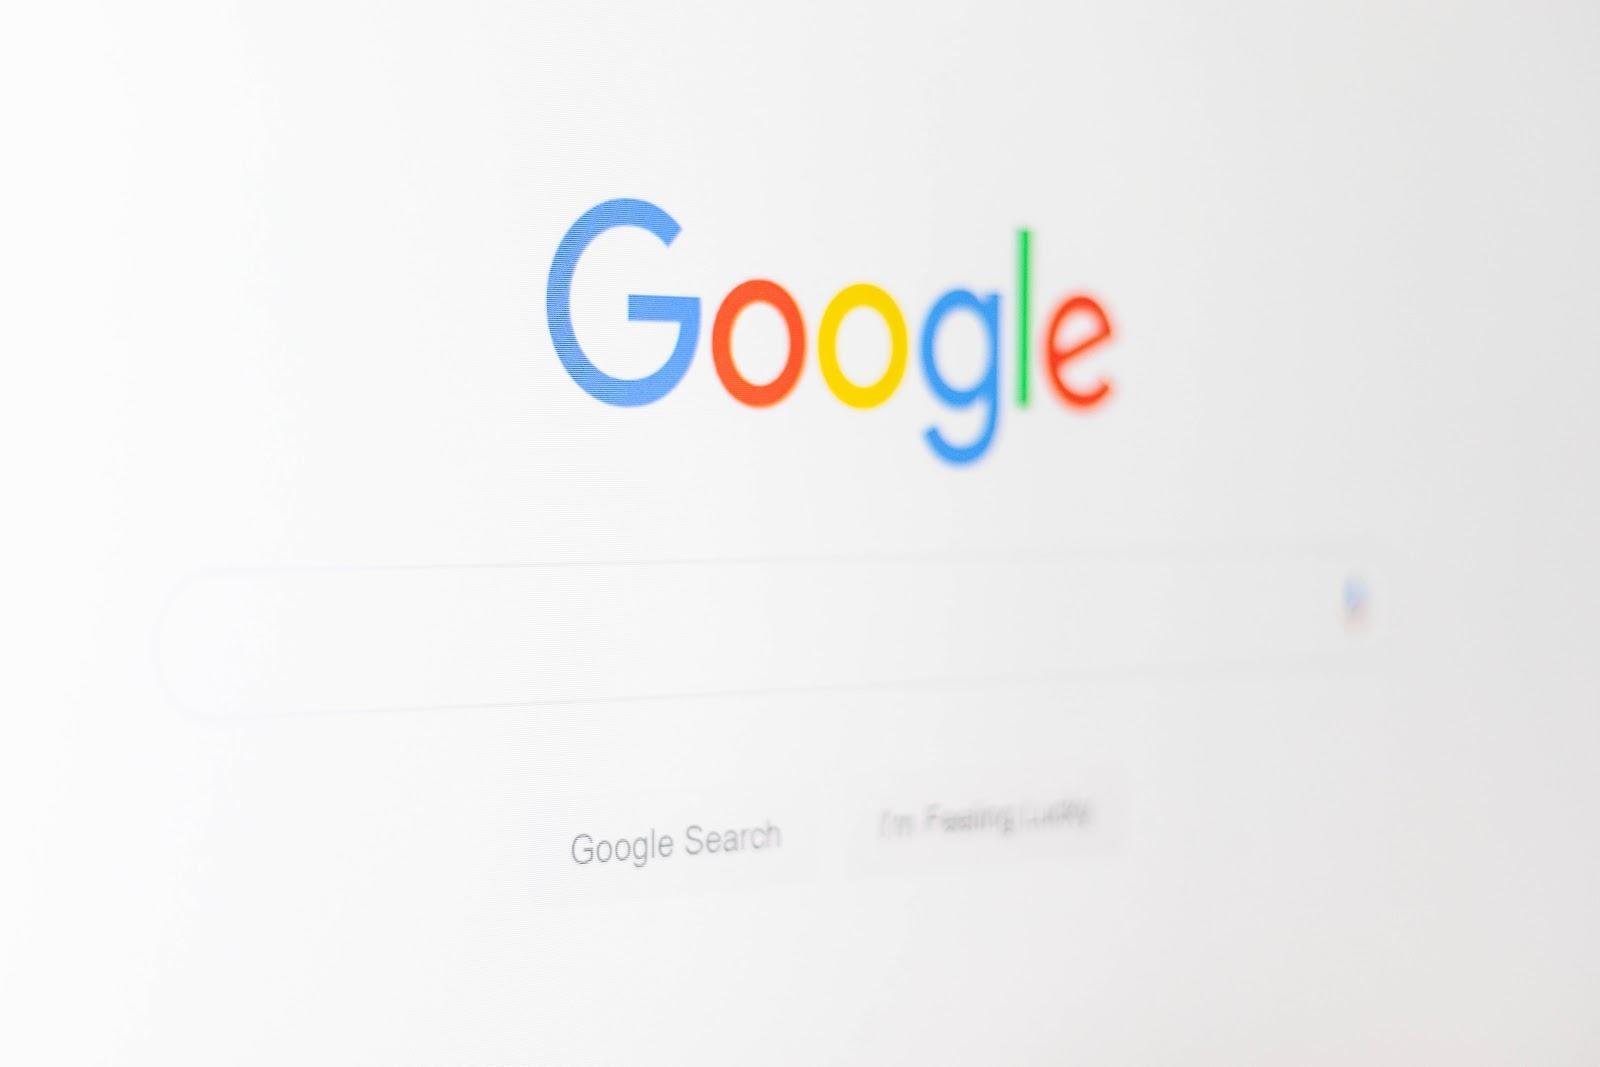 Google startpagina